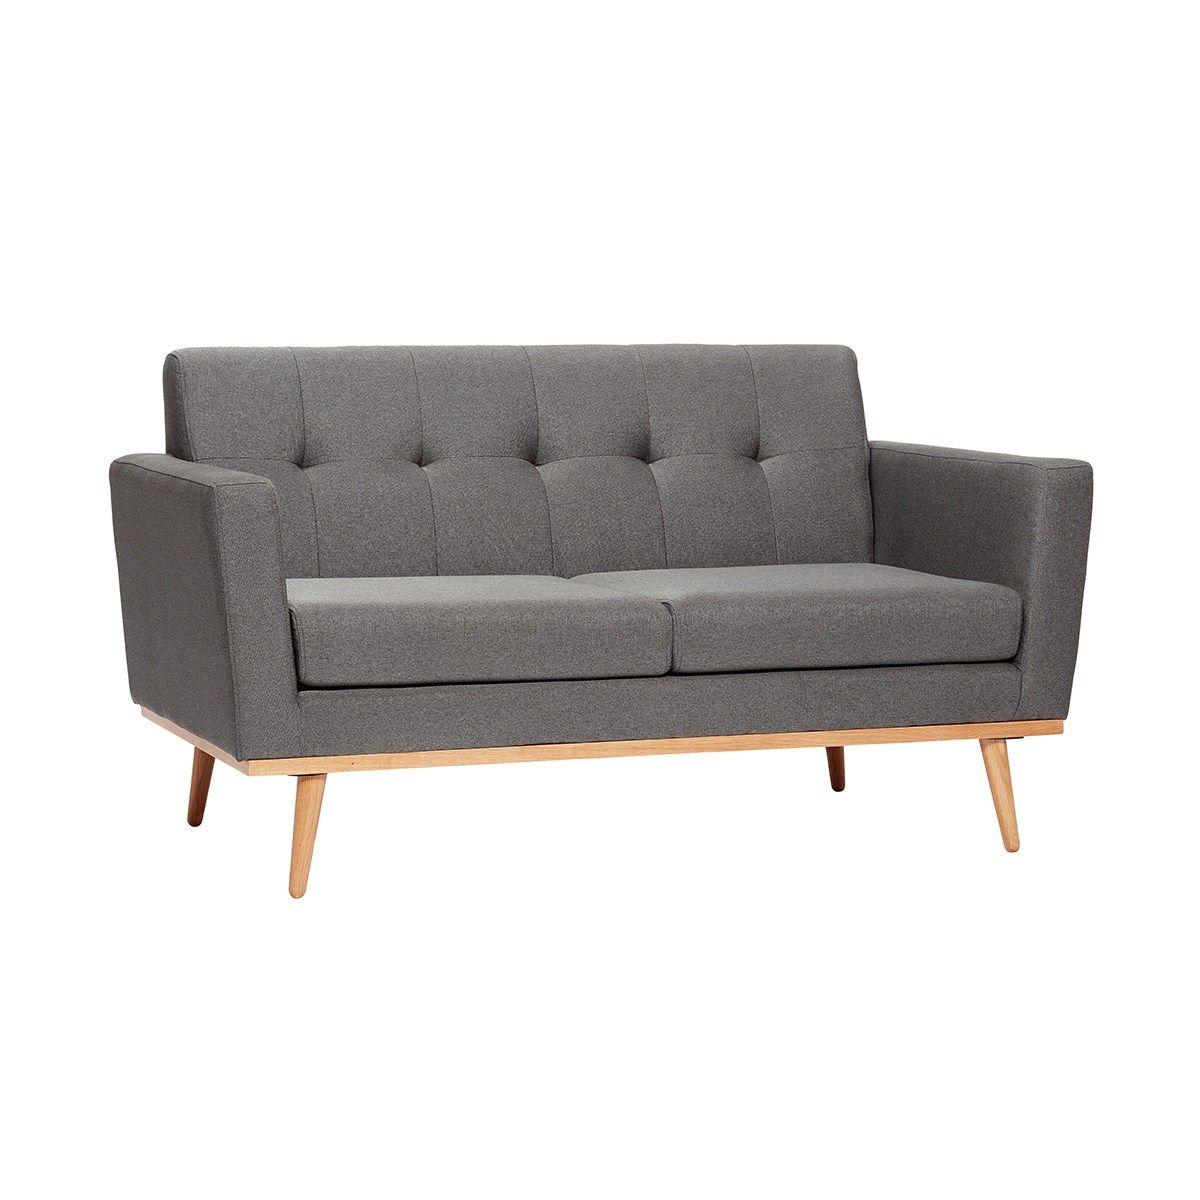 Dark Grey Sofa Dark Gray Sofa Cosy Sofa Gray Sofa